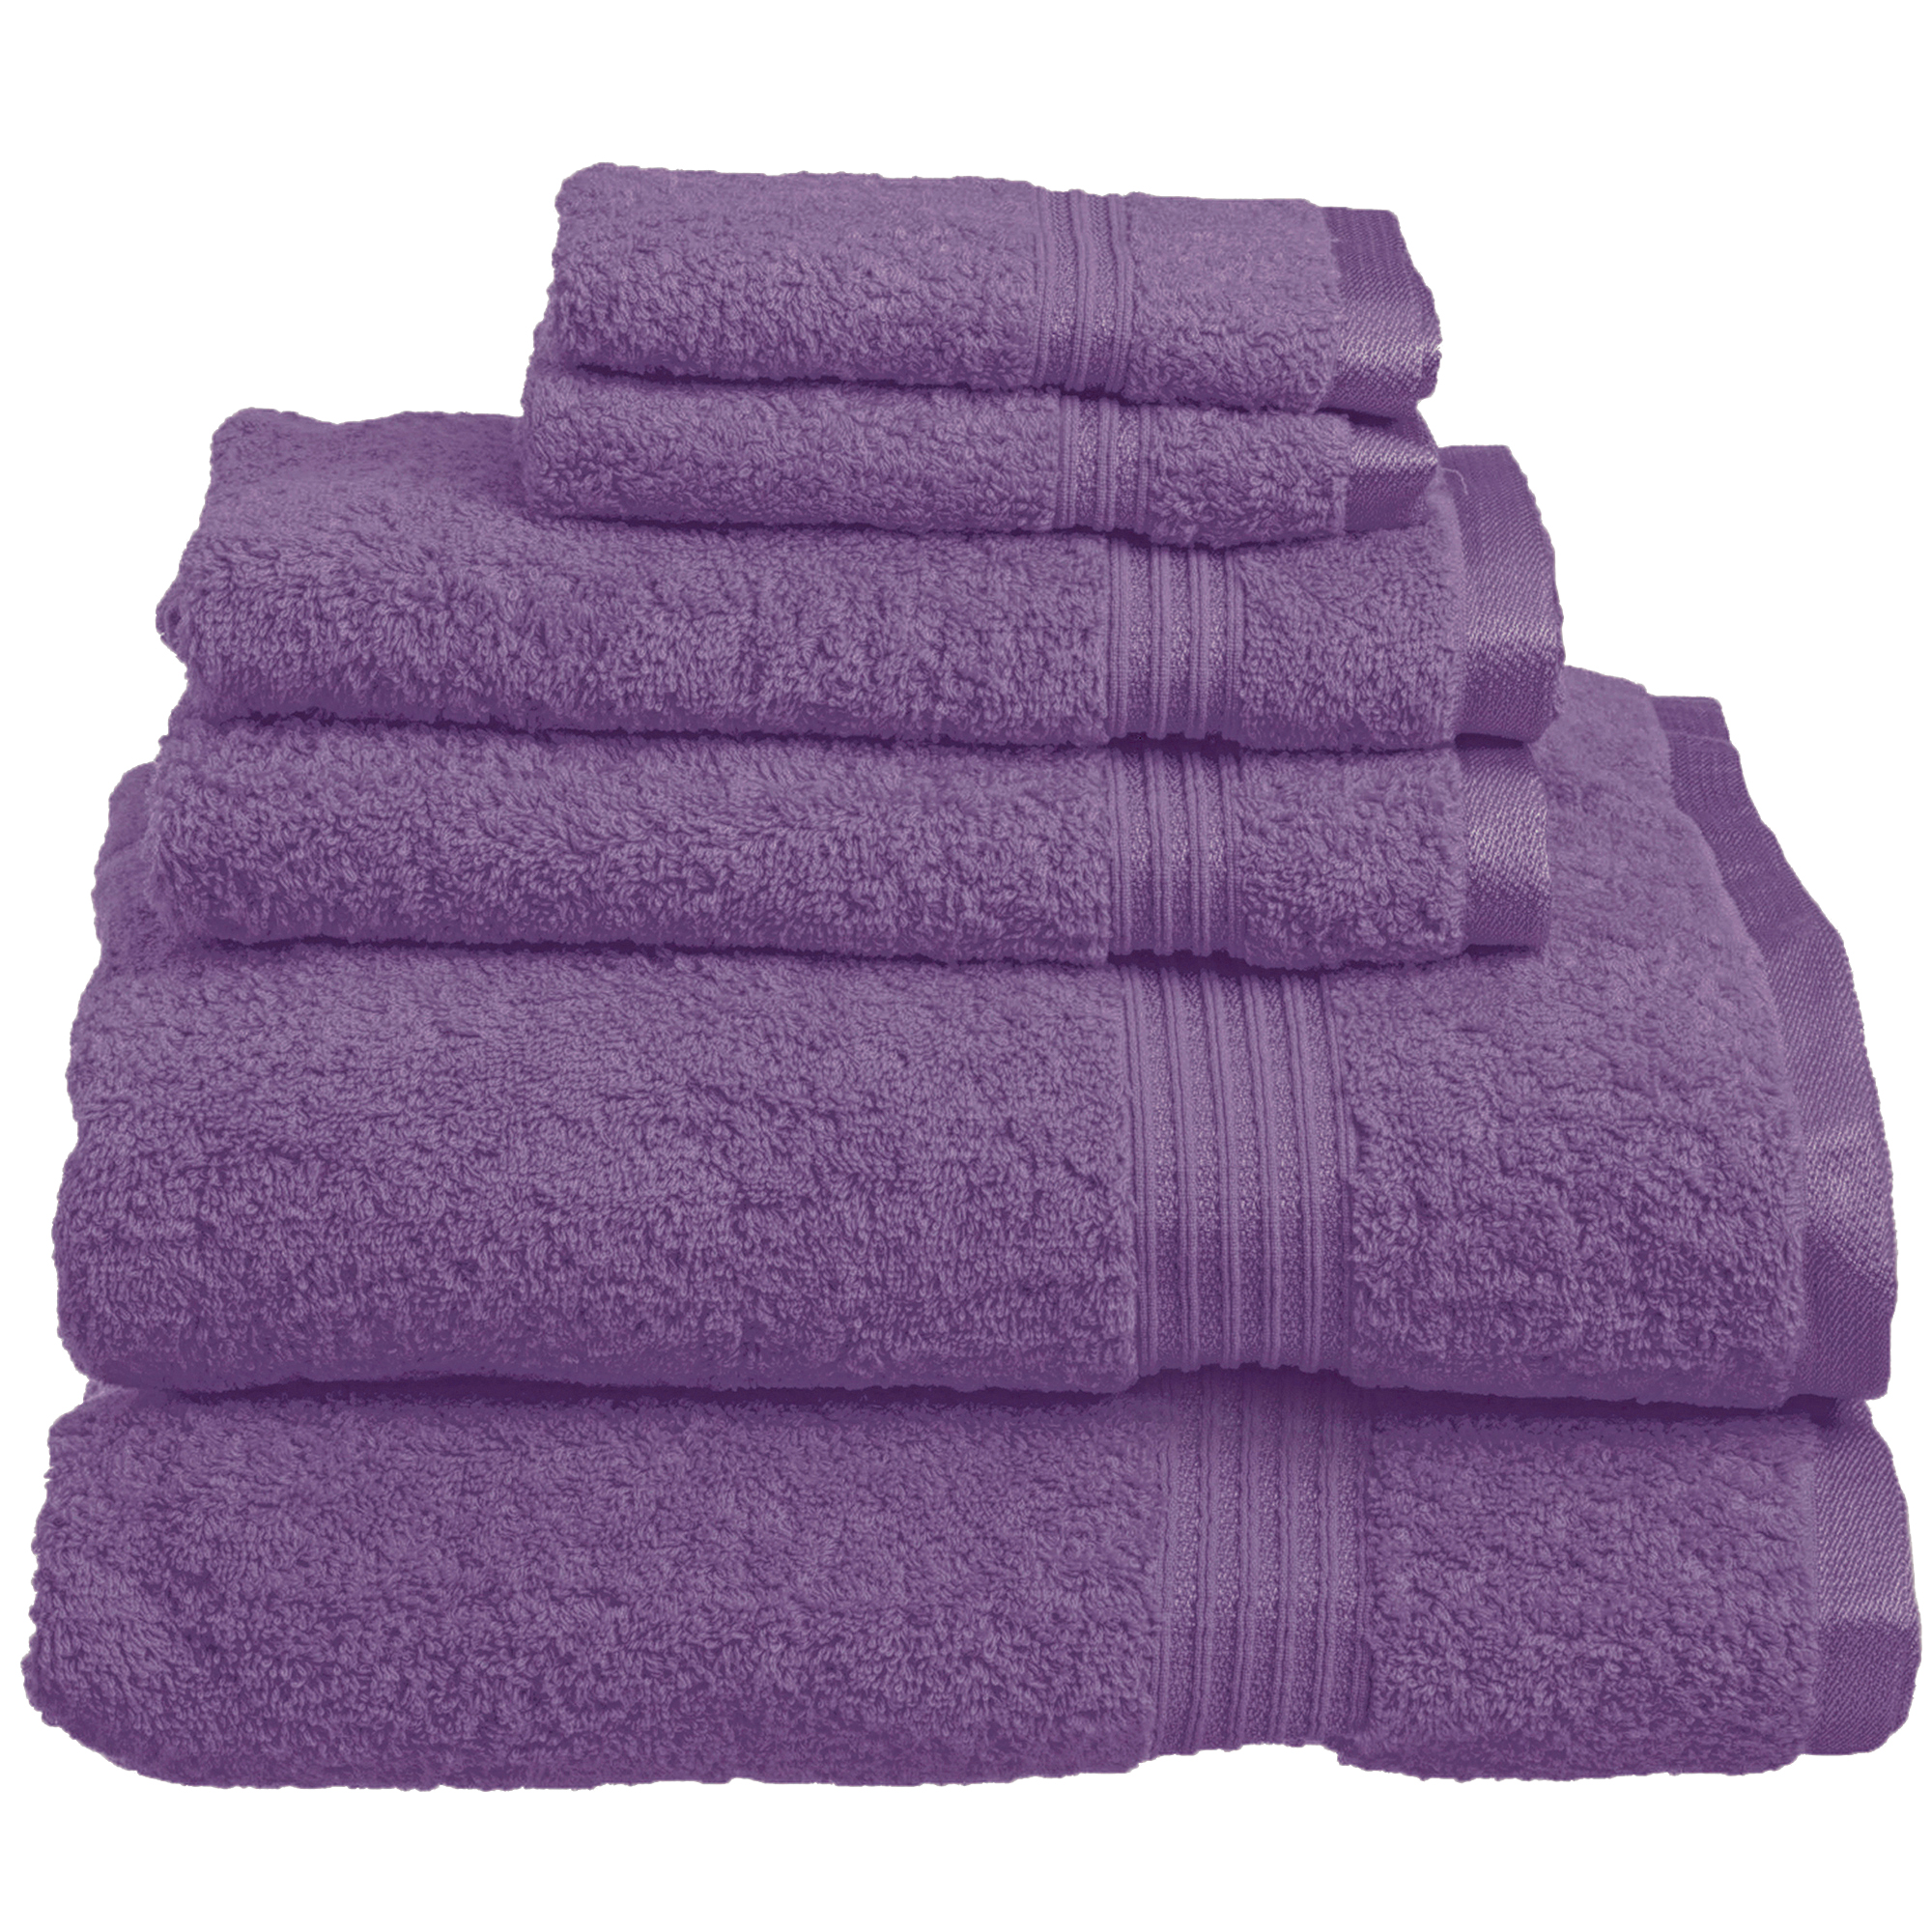 Superior 600GSM Long-Staple Combed Cotton 6-Piece Towel Set